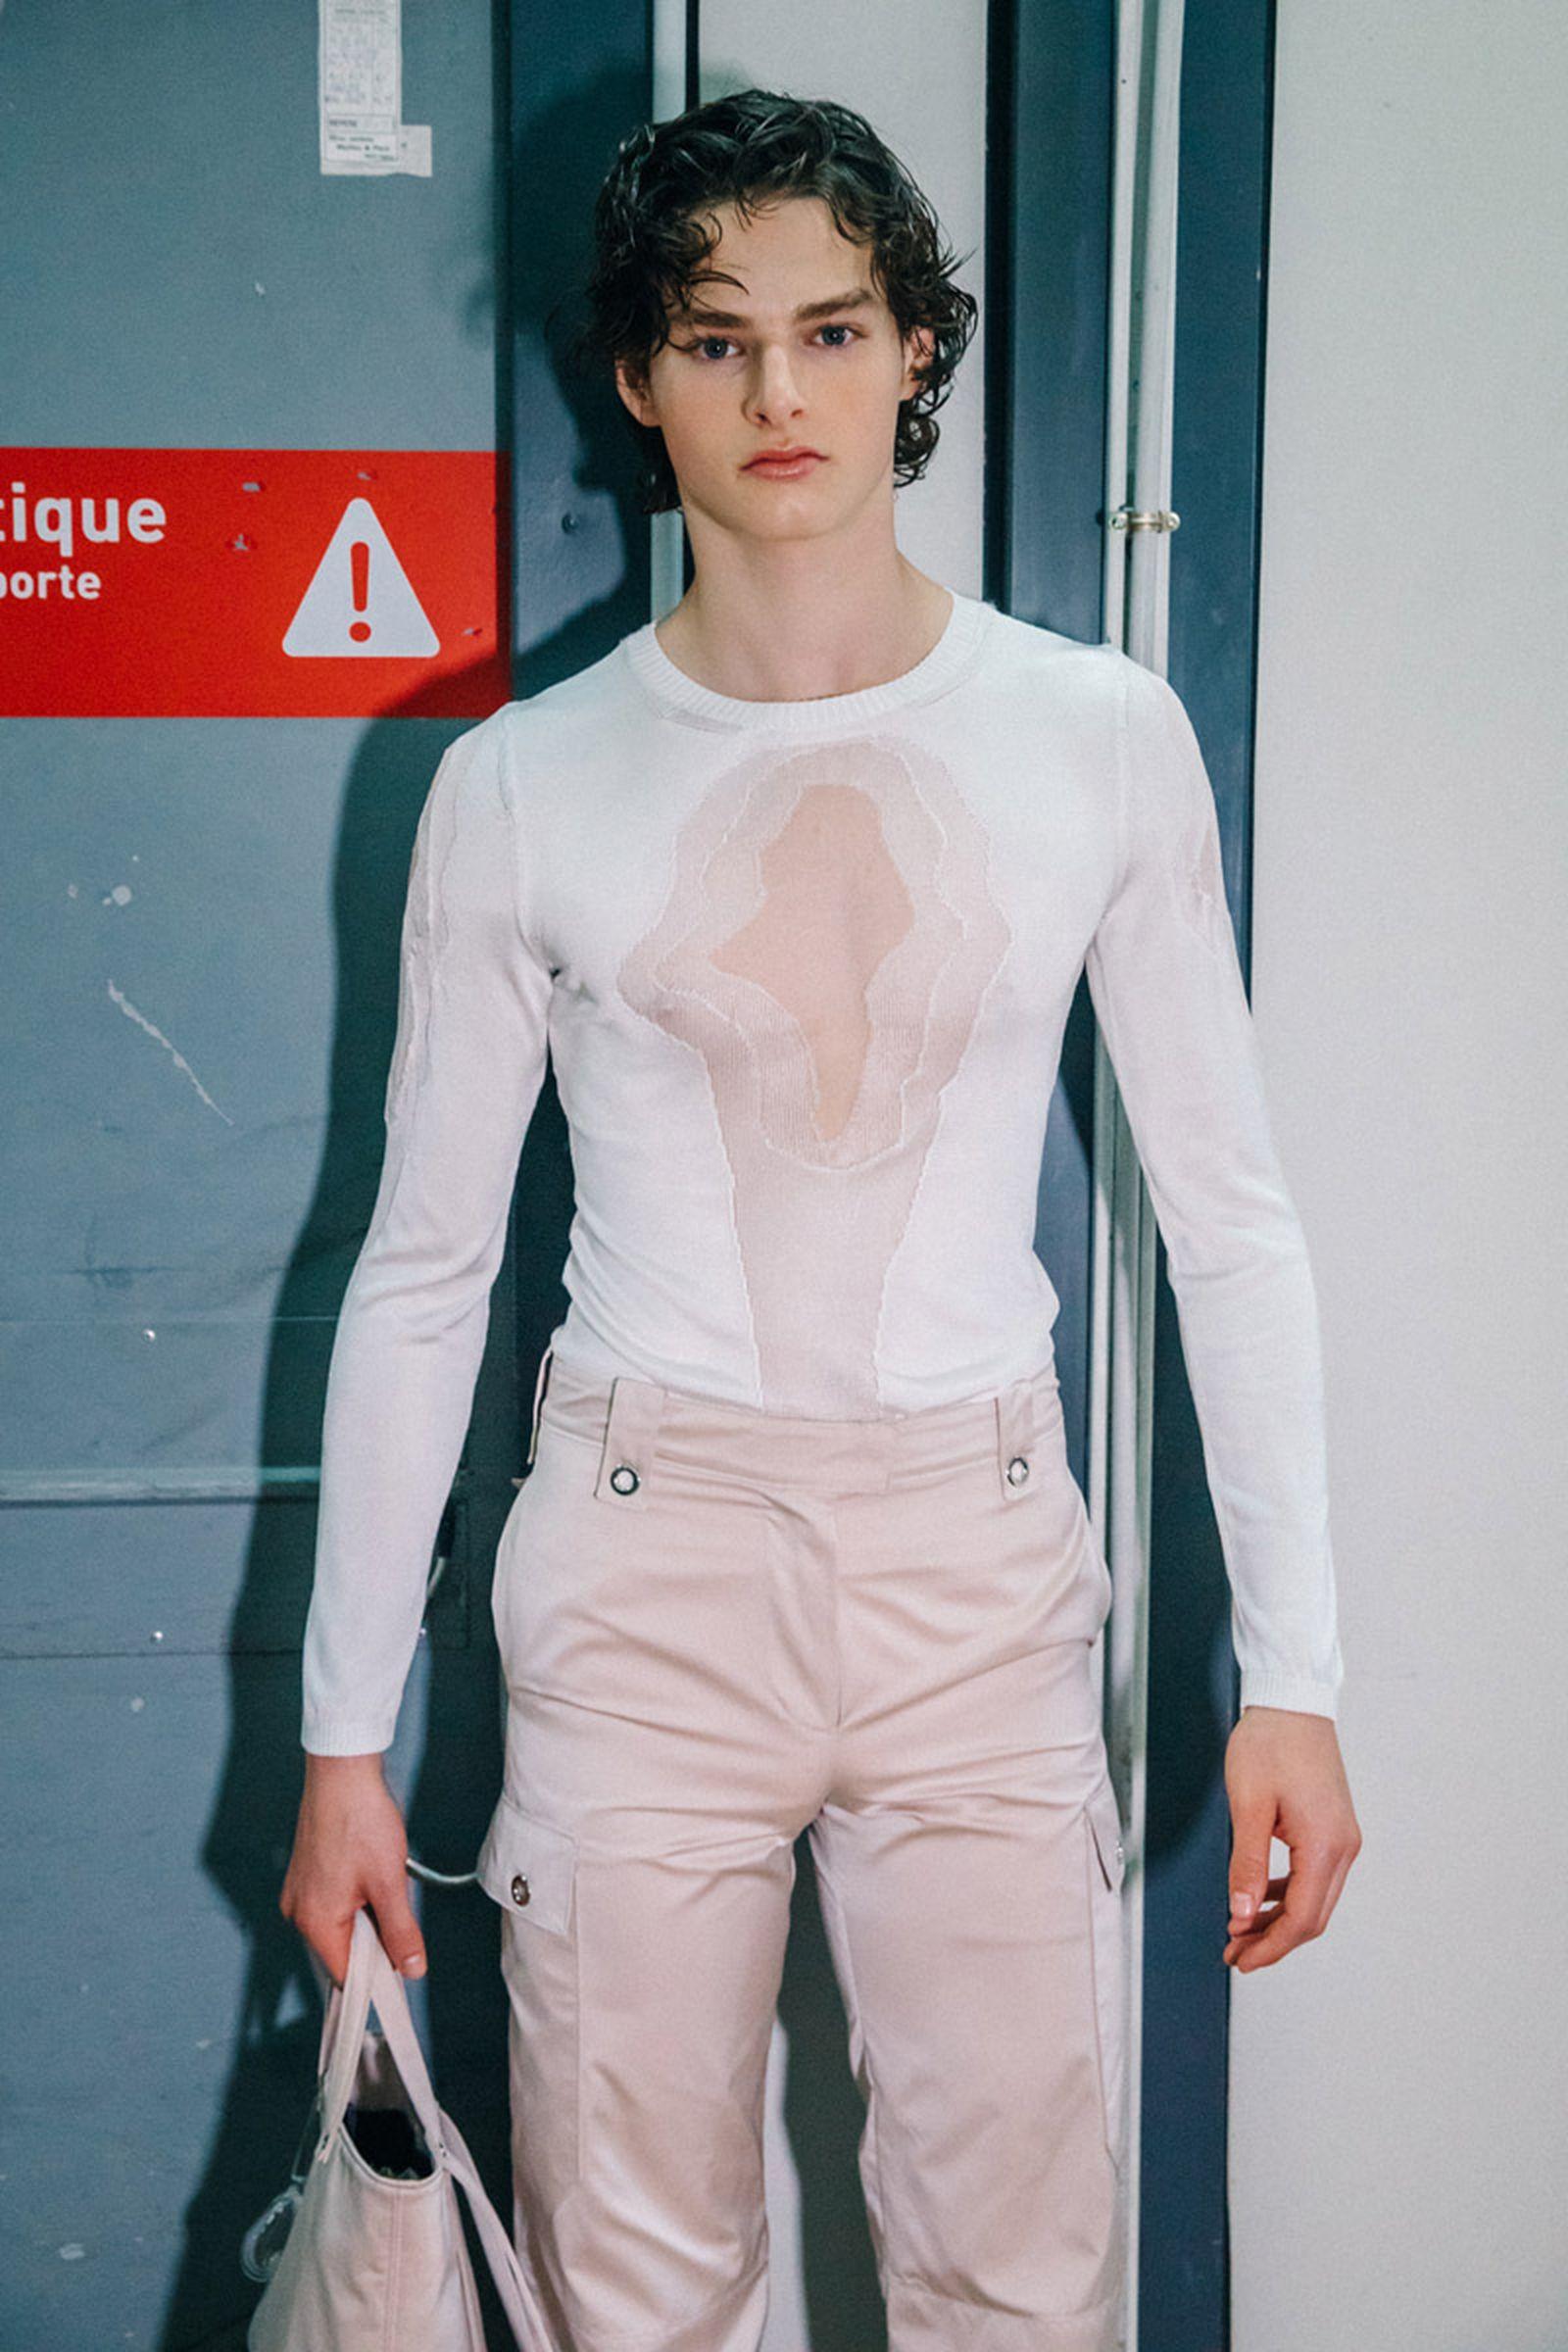 MSS20 Paris Ludovic de Saint Sernin Julien Tell For Web 09 paris fashion week runway